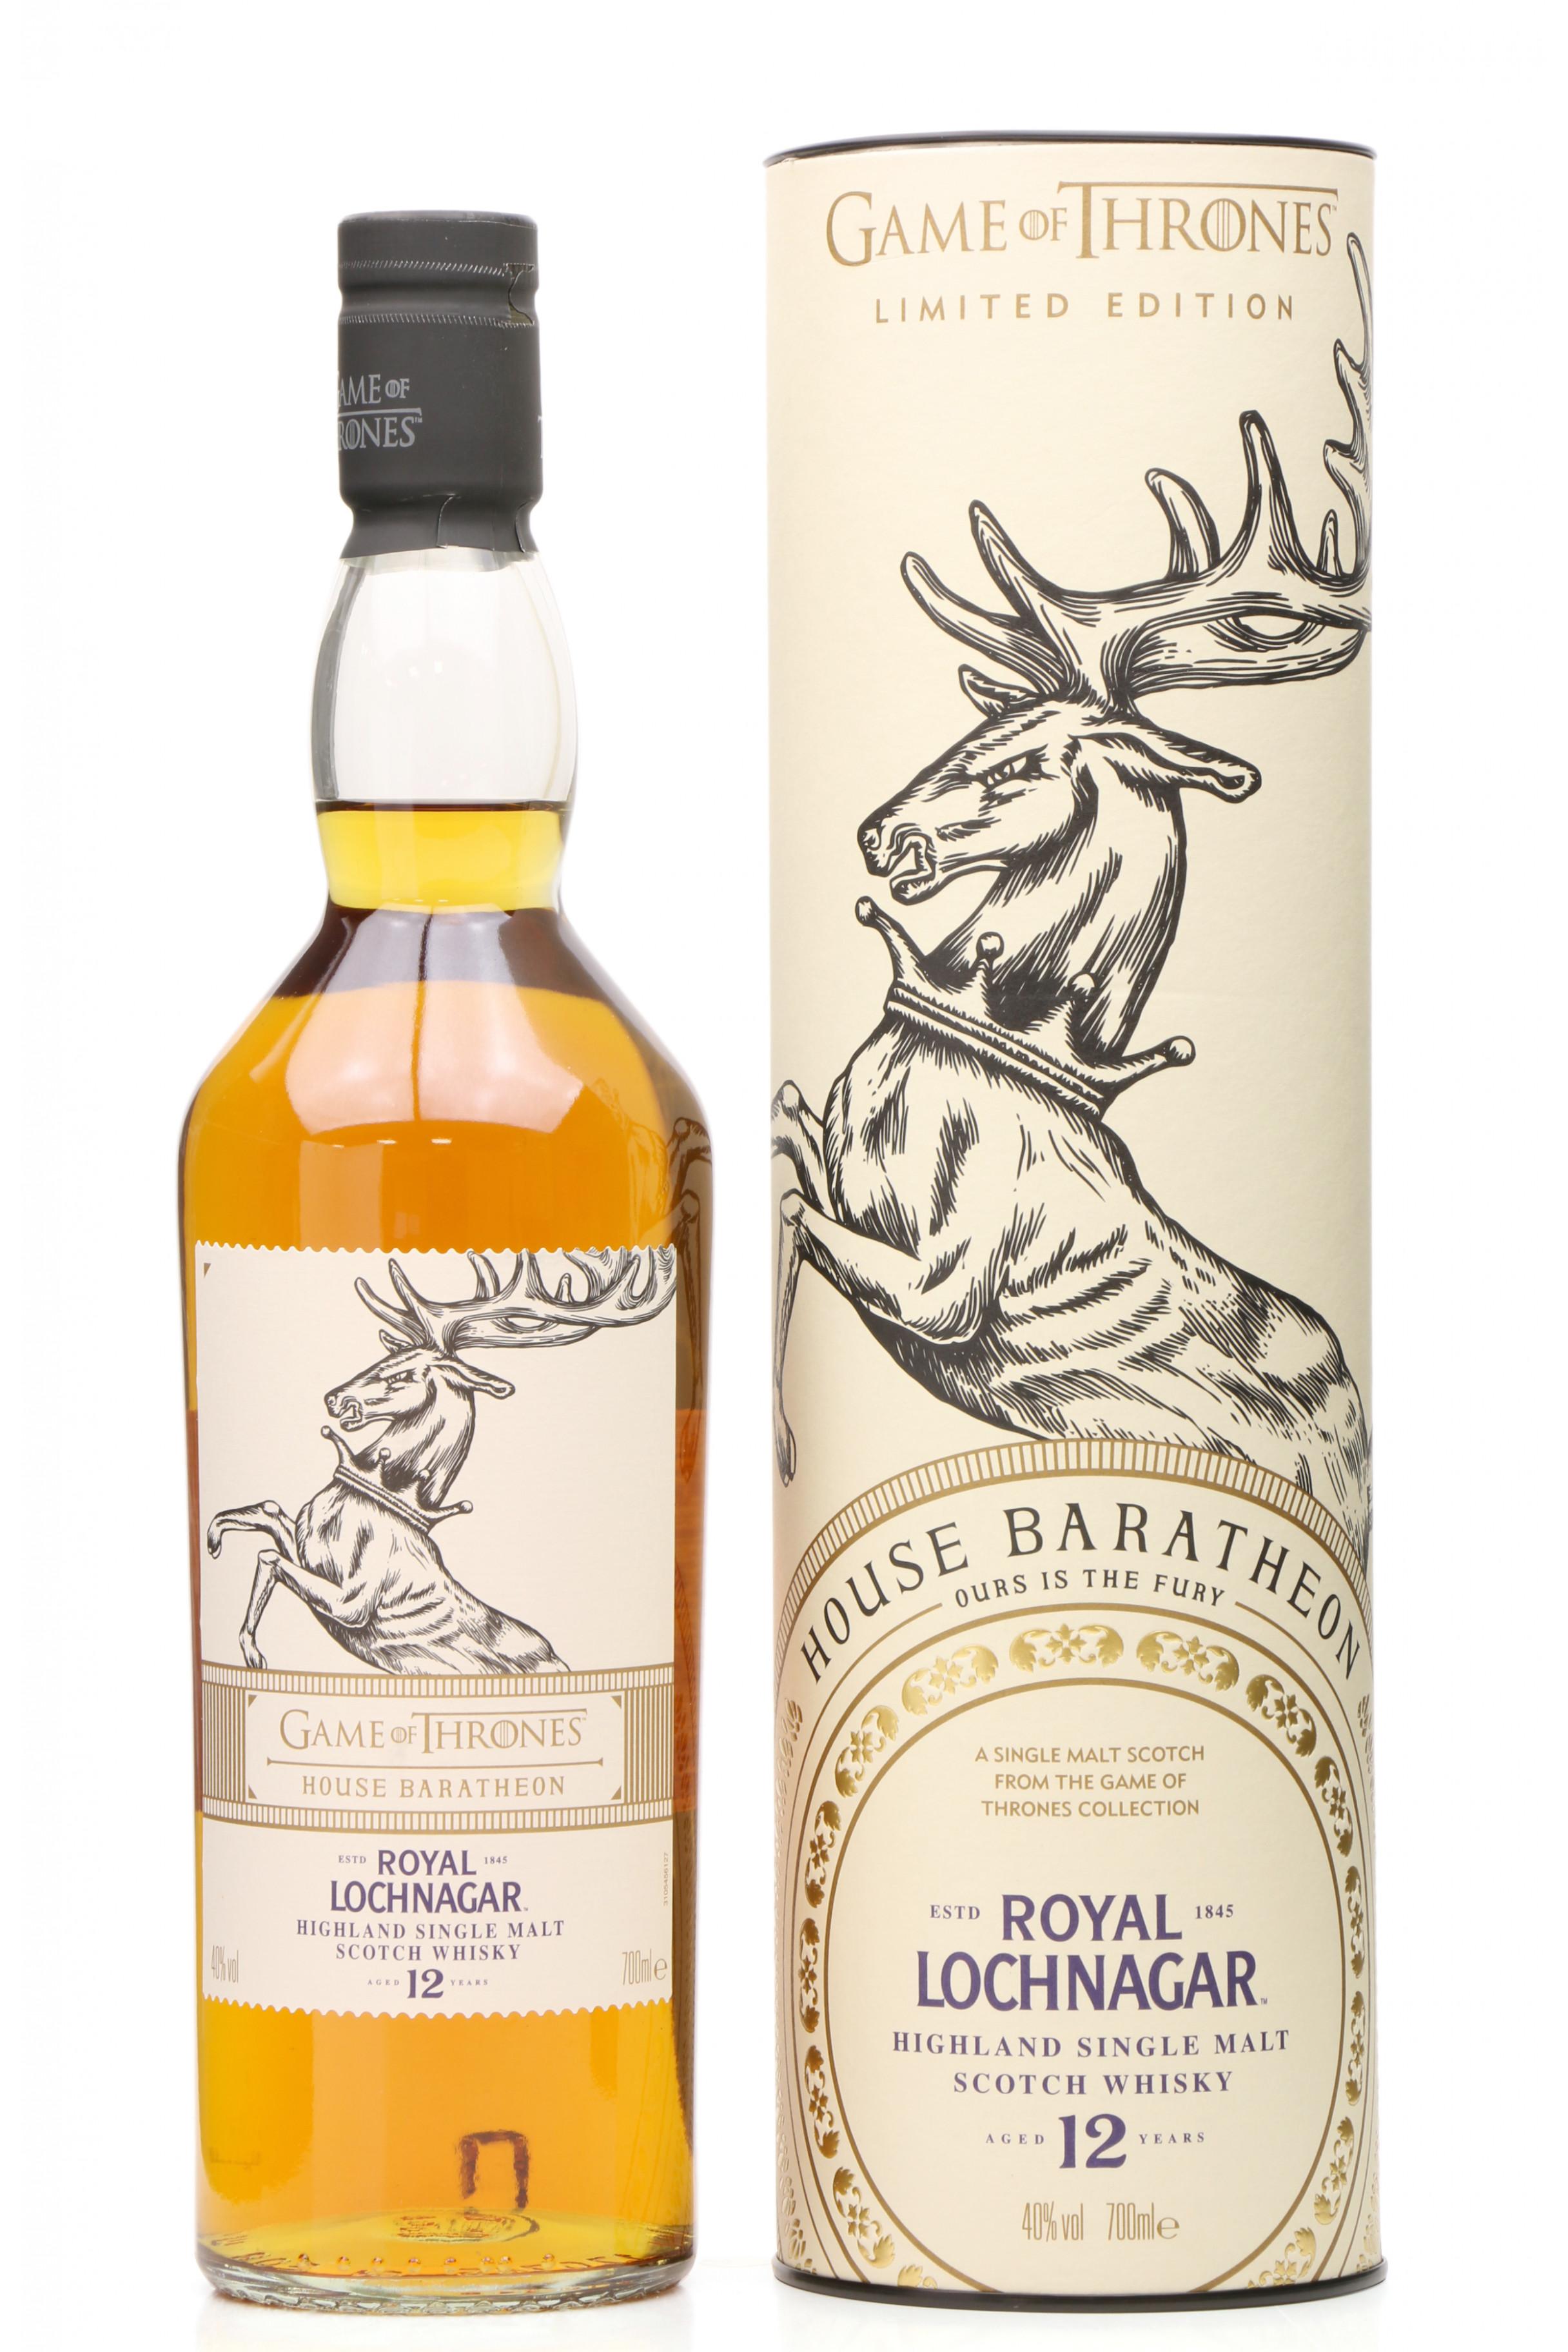 Limited Edition Game of Thrones Whisky Bottle EMPTY Royal Lochnagar Baratheon